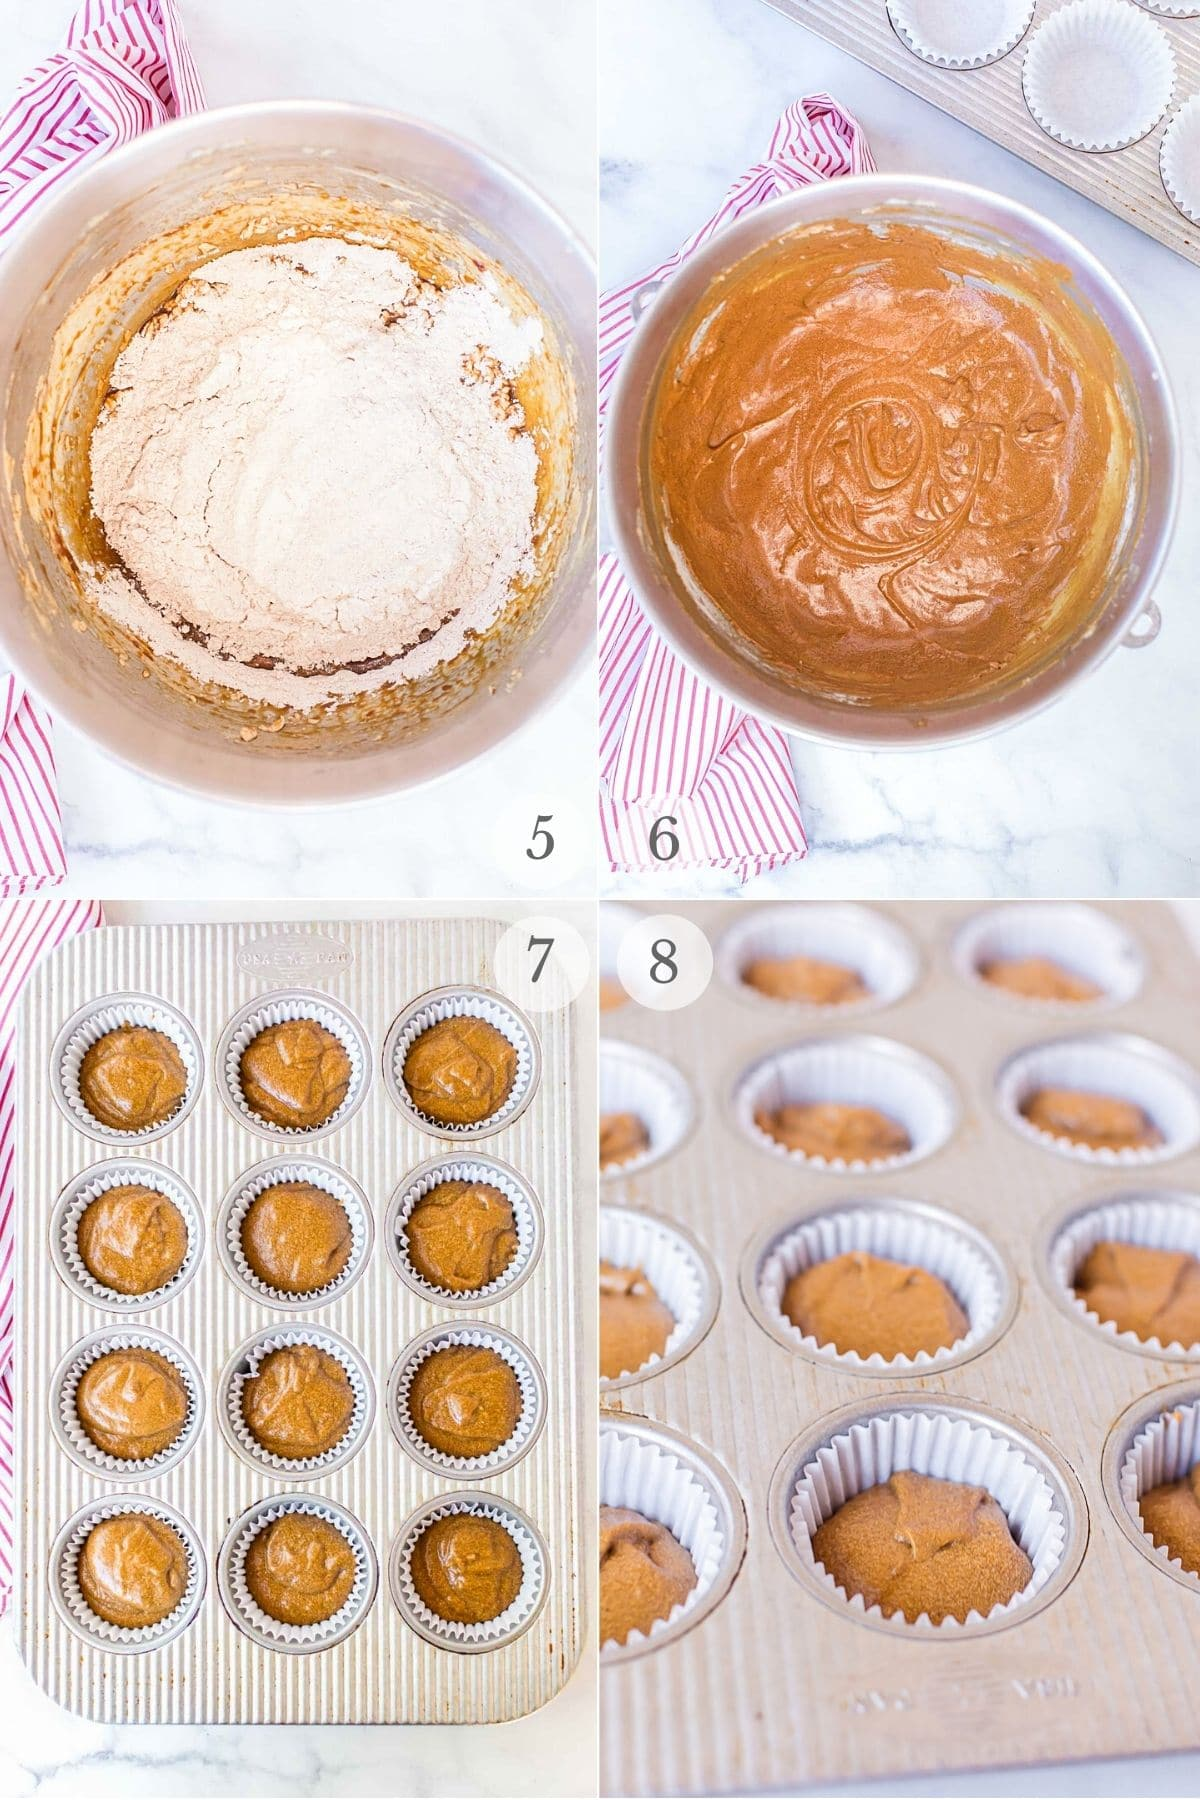 gingerbread cupcakes recipe steps 5-8